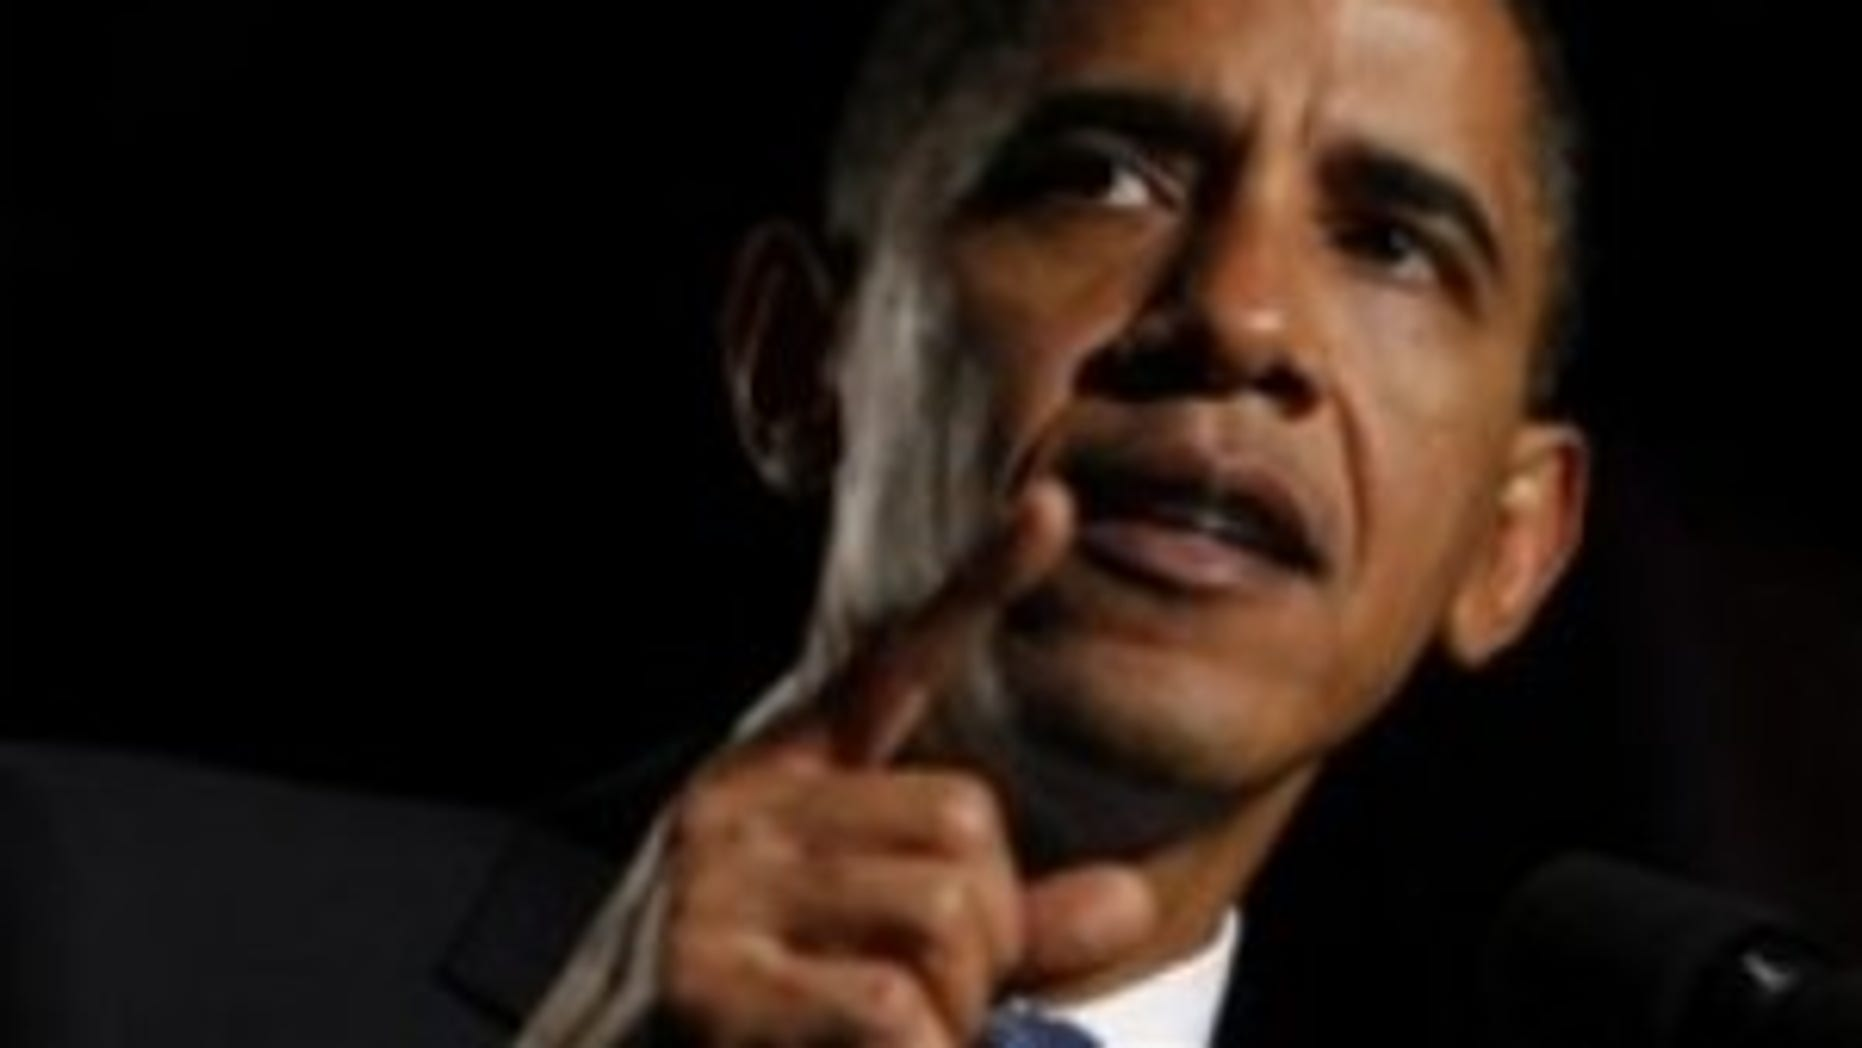 President Obama speaks at a DNC fundraiser in San Francisco, CA on Thursday evening. (AP Photo)